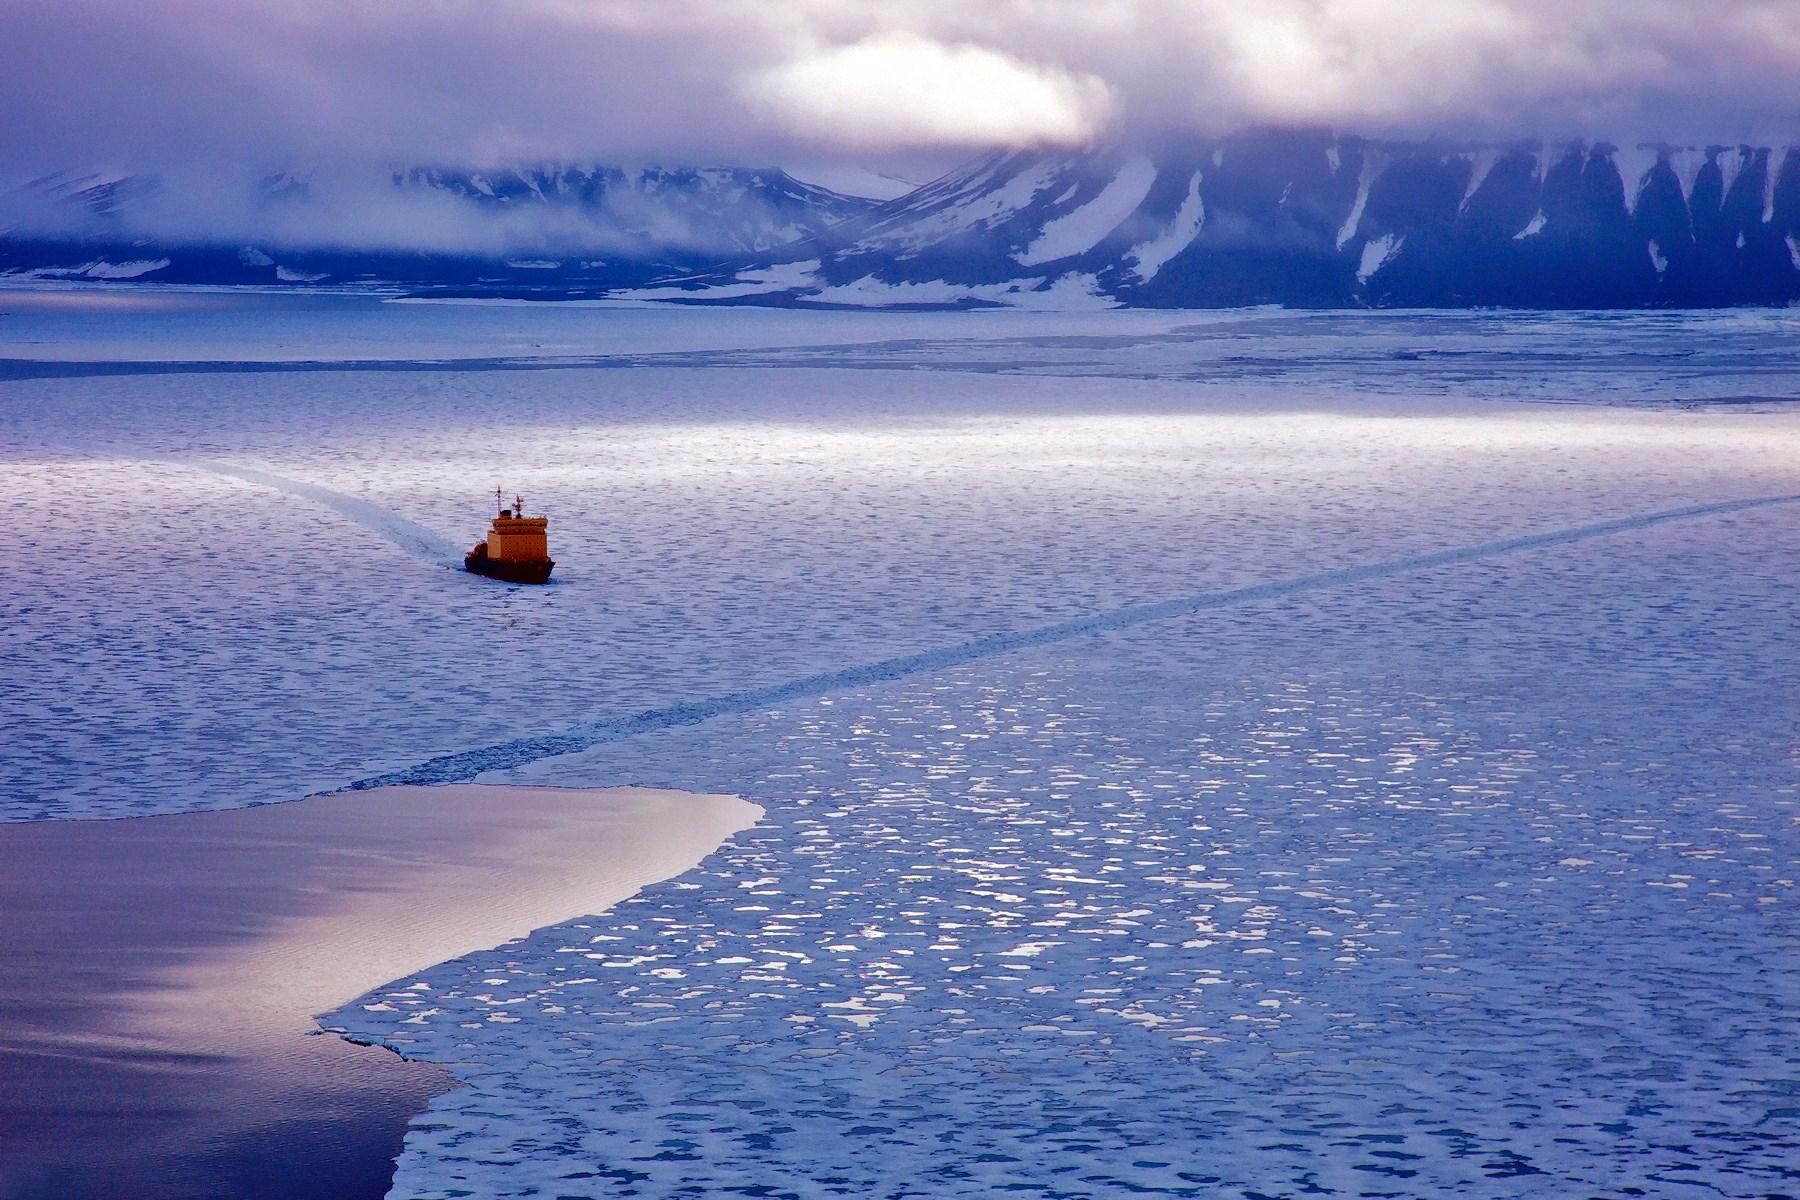 00 Vadim Balakin. The Spirit of Adventure. Icebreaker Kapitan Dranitsyn in the Far North. Arctic Ocean. Frants Iosif Land. 2015